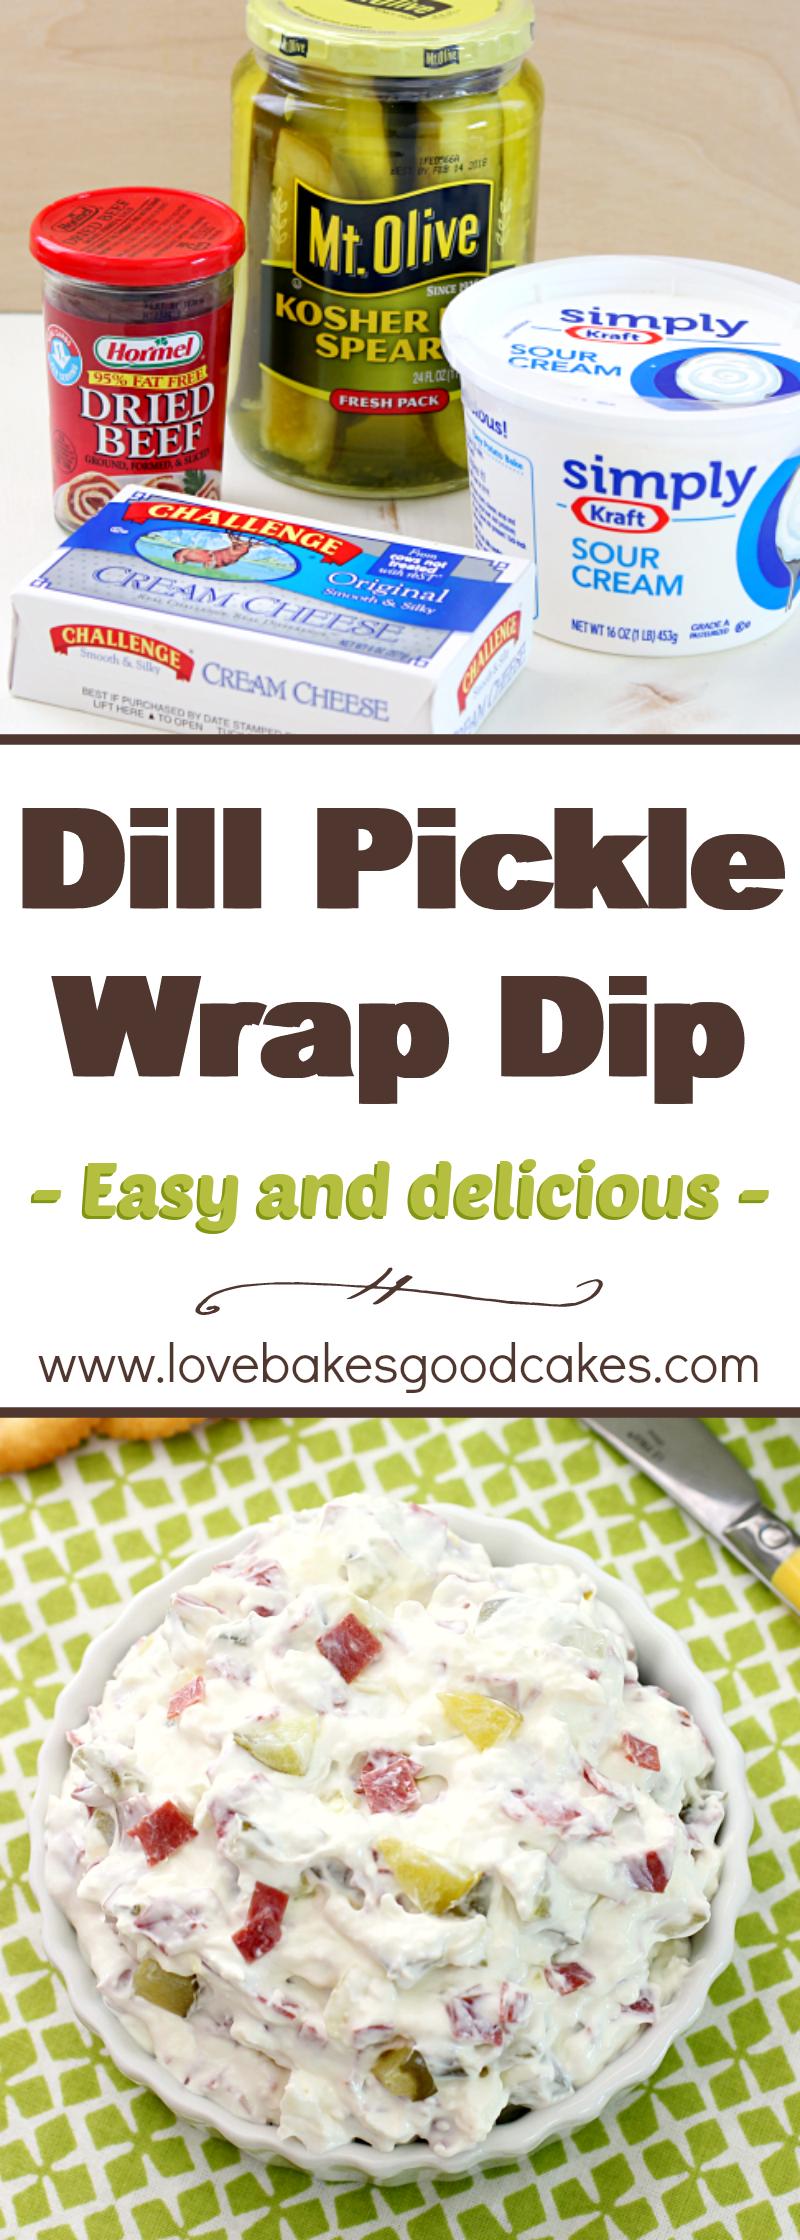 Dill Pickle Wrap Dip Recipe Pickle Wrap Dip Pickle Wraps Diy Food Recipes